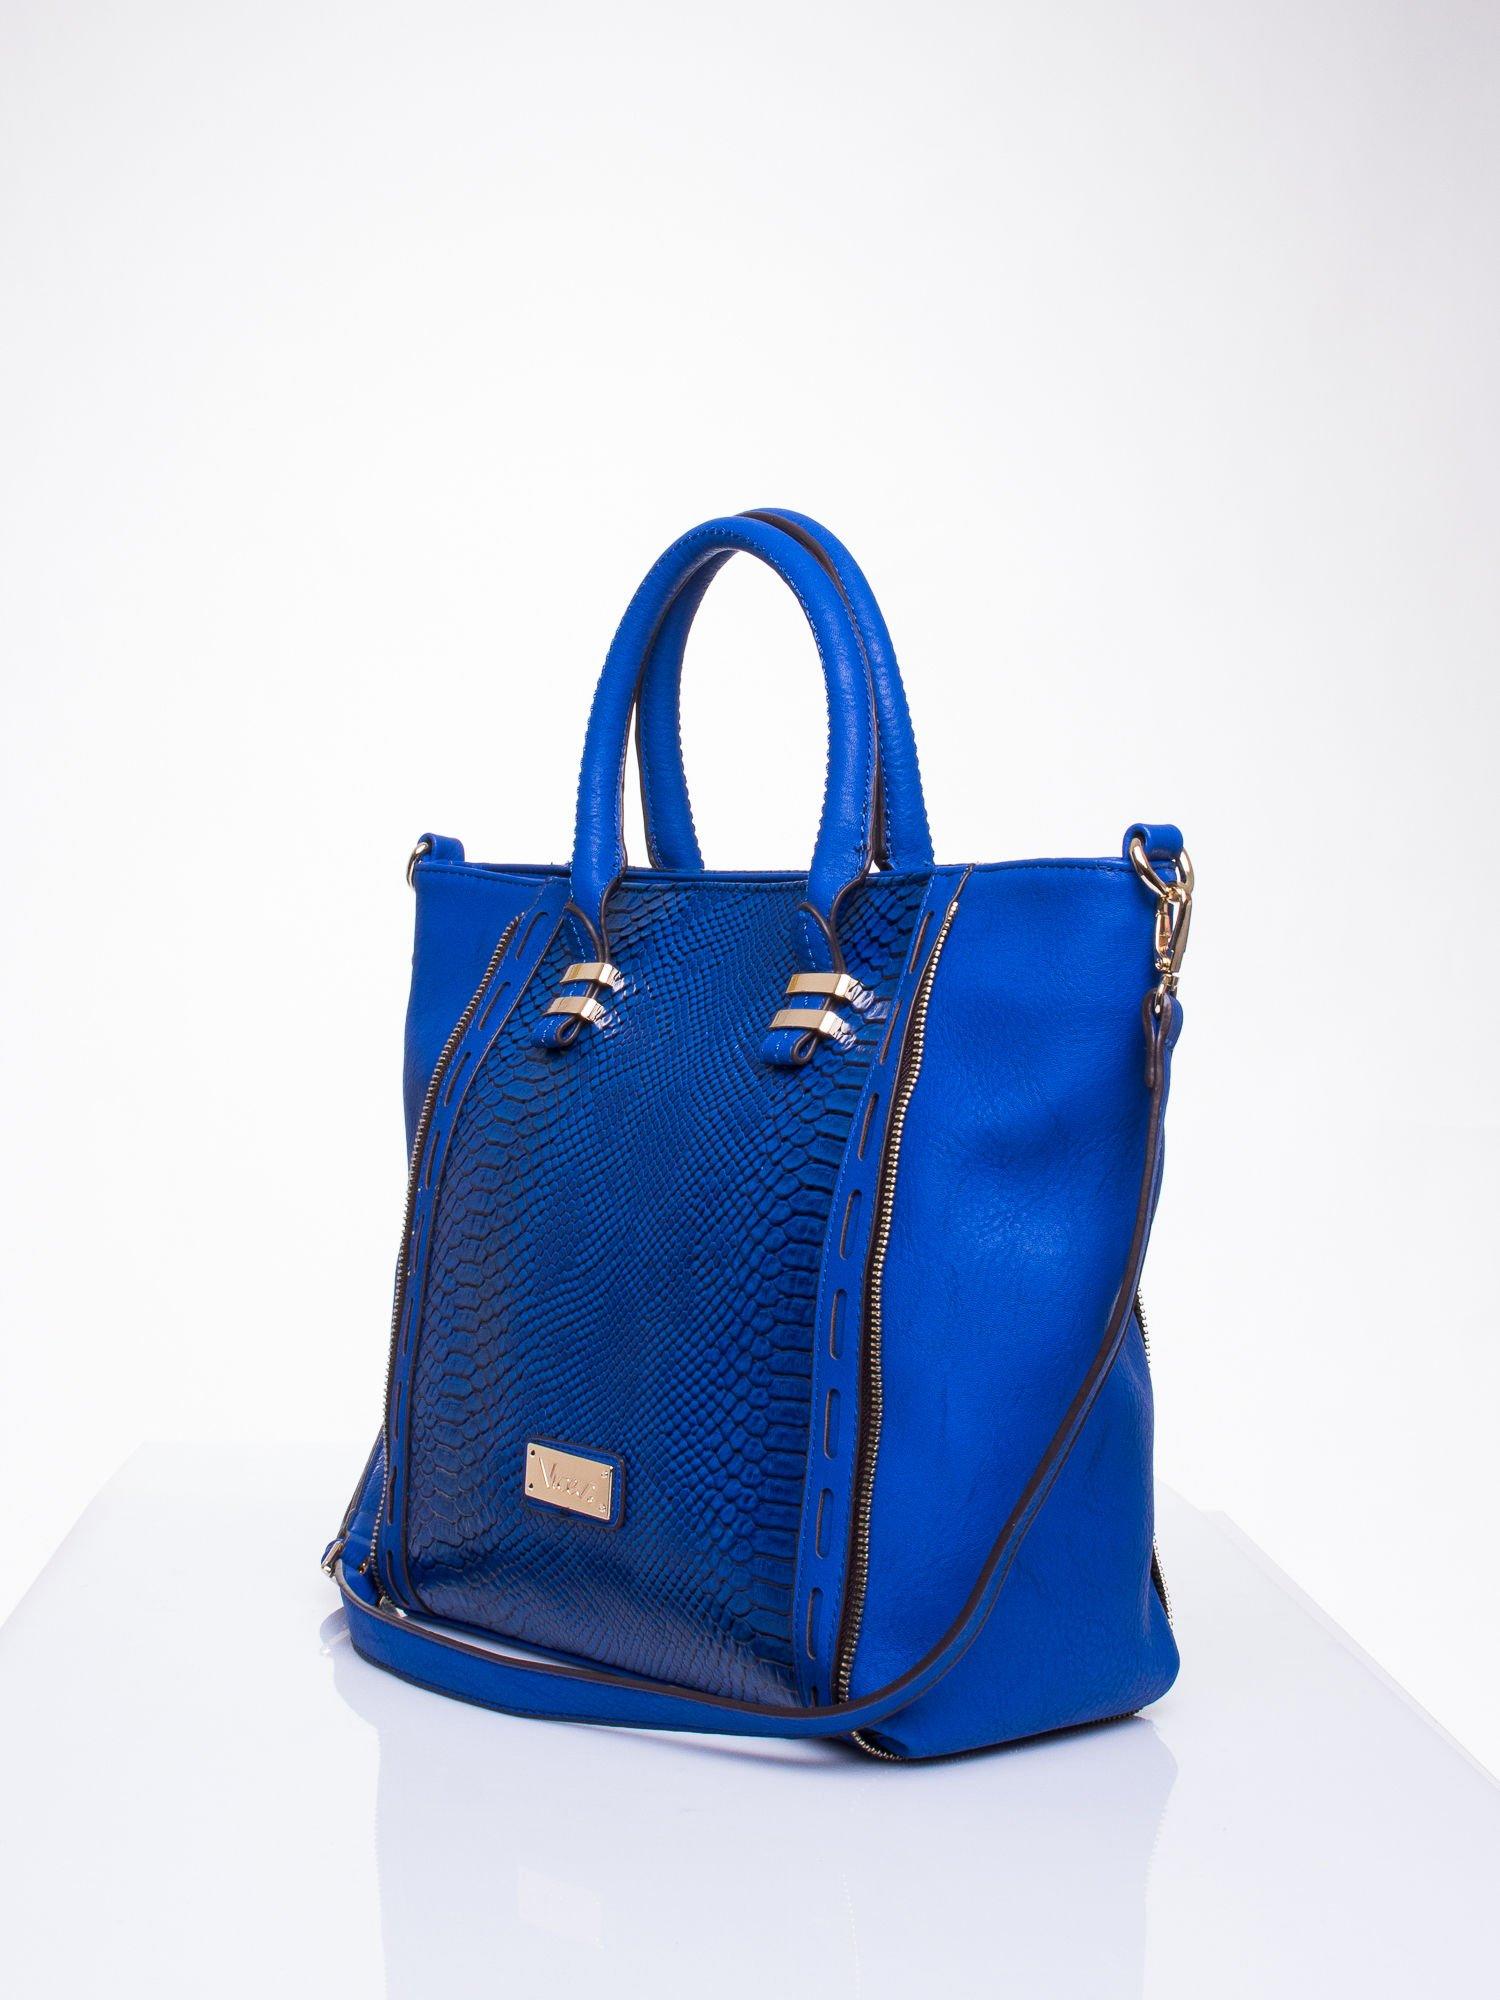 Niebieska torba shopper bag z wzorem skóry węża                                  zdj.                                  3